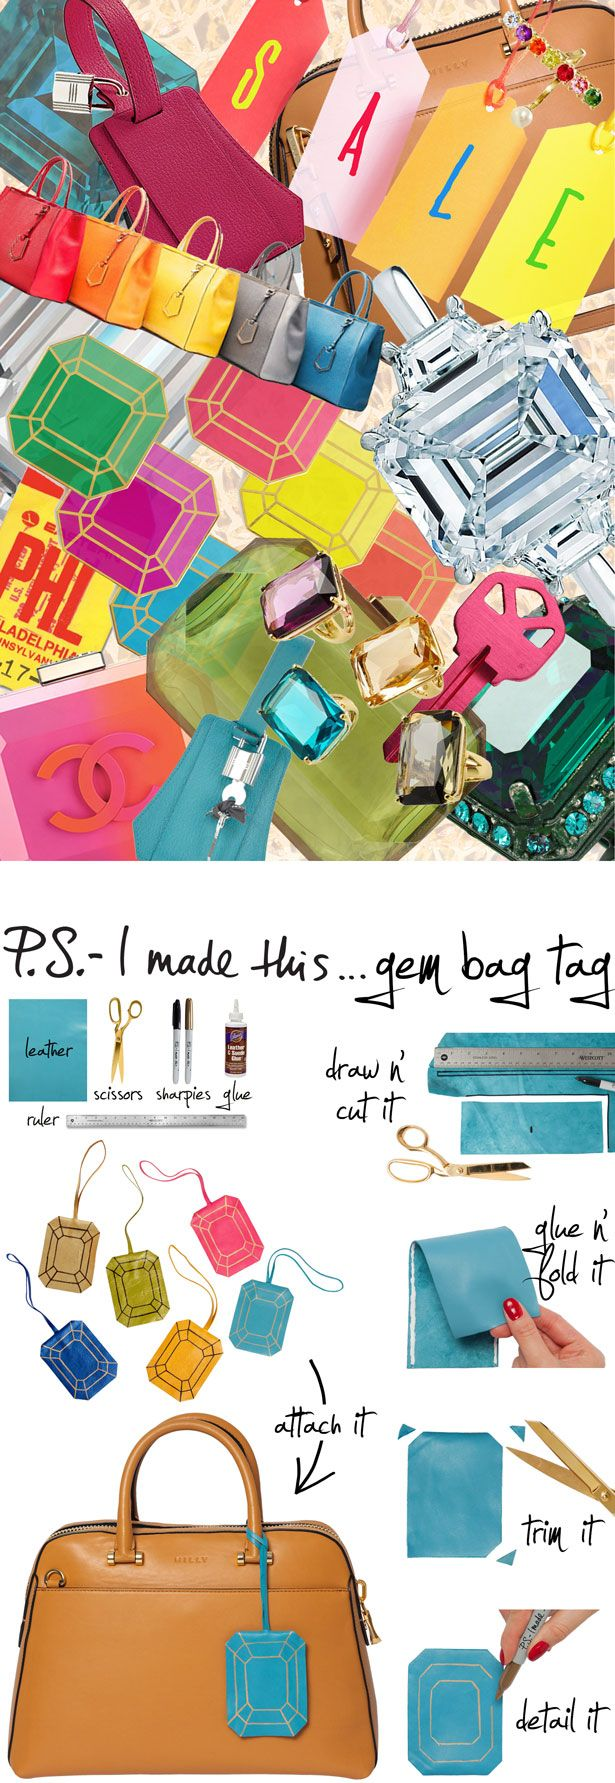 P.S.-I made this...Gem Bag Tag #PSIMADETHIS #DIY